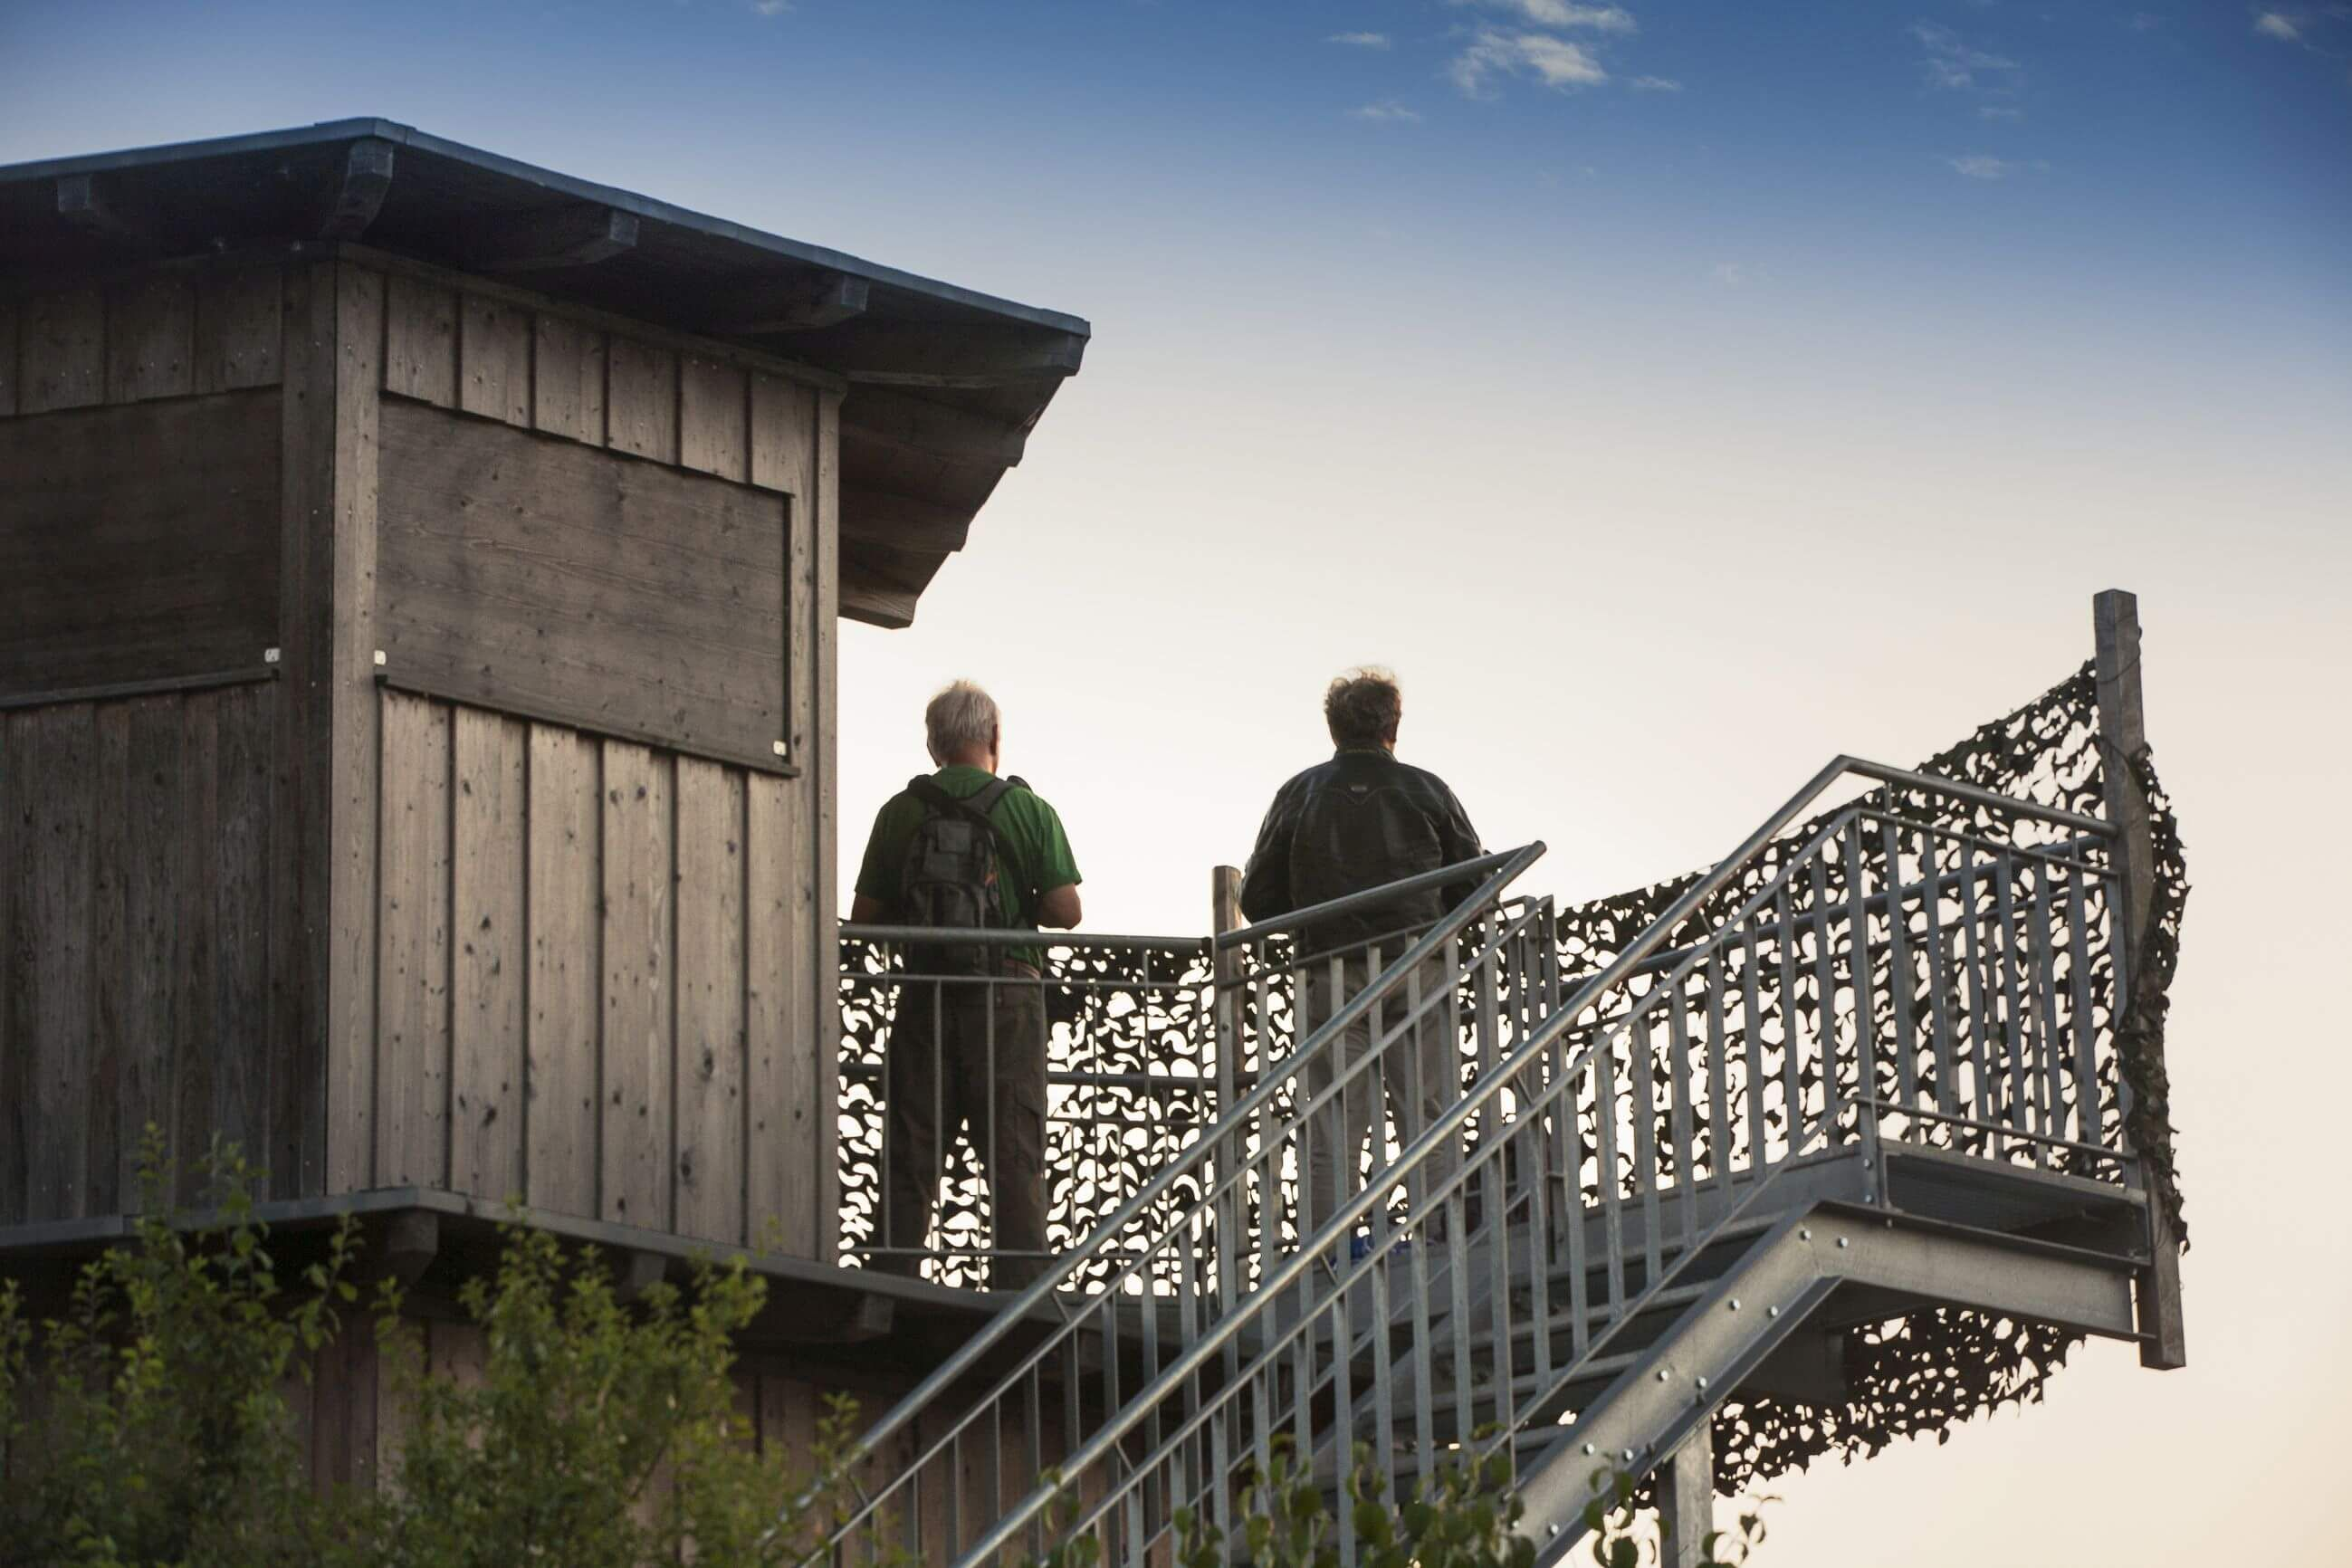 Vogelbeobachtung am Plessenteich in Neu-Ulm